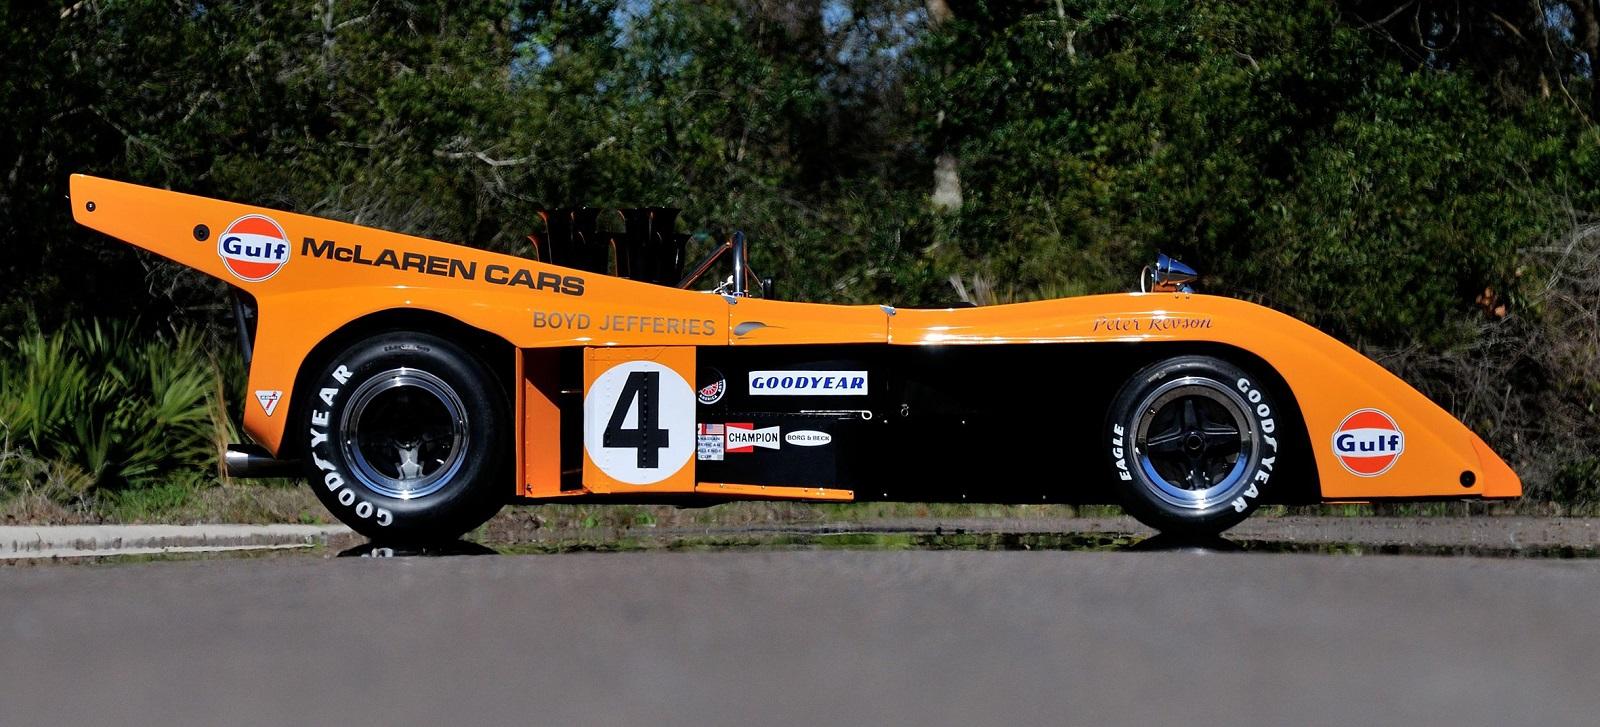 McLaren_Gulf